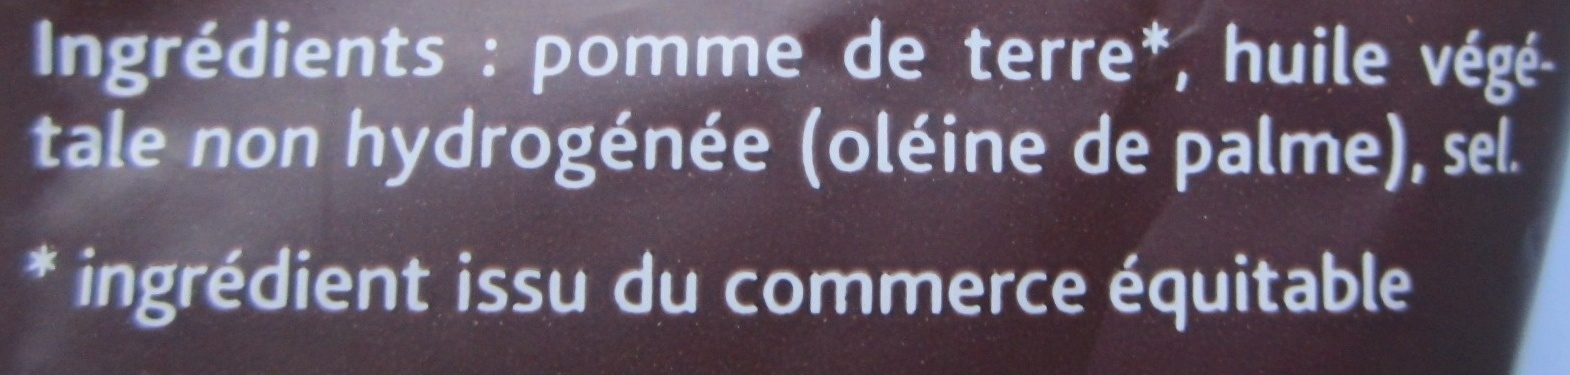 Chips de pomme de terre rouge - Ingrediënten - fr